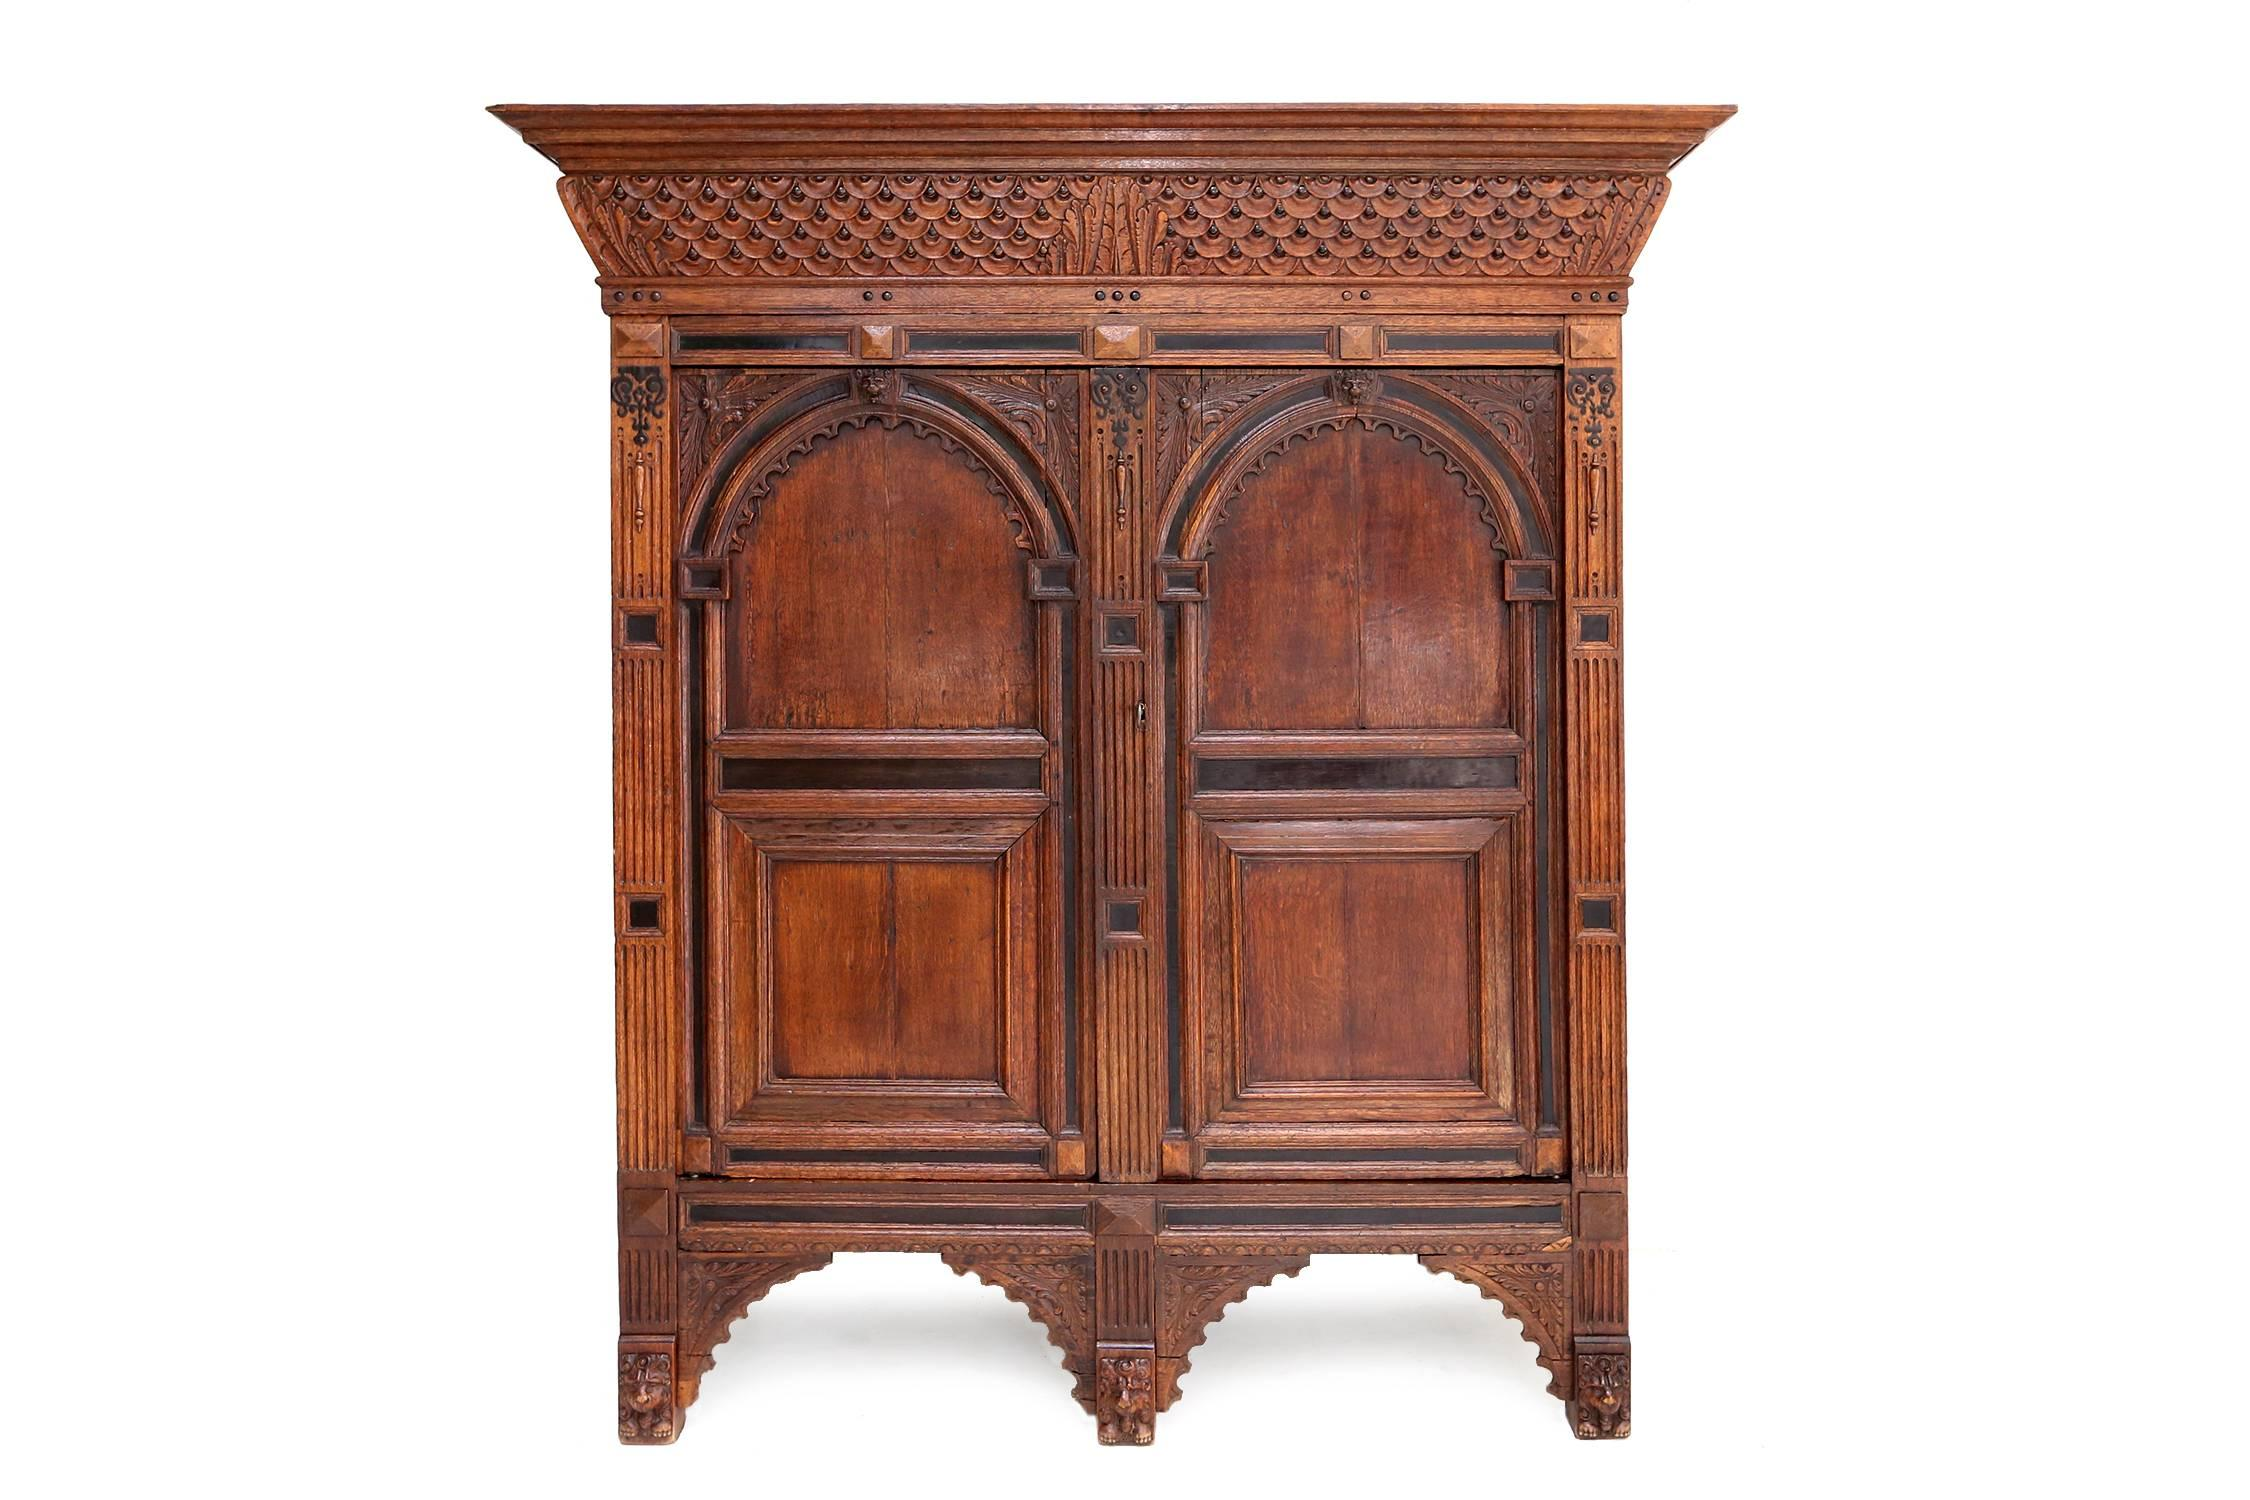 Eclectic antique Dutch Renaissance Cabinet For Sale at 1stdibs